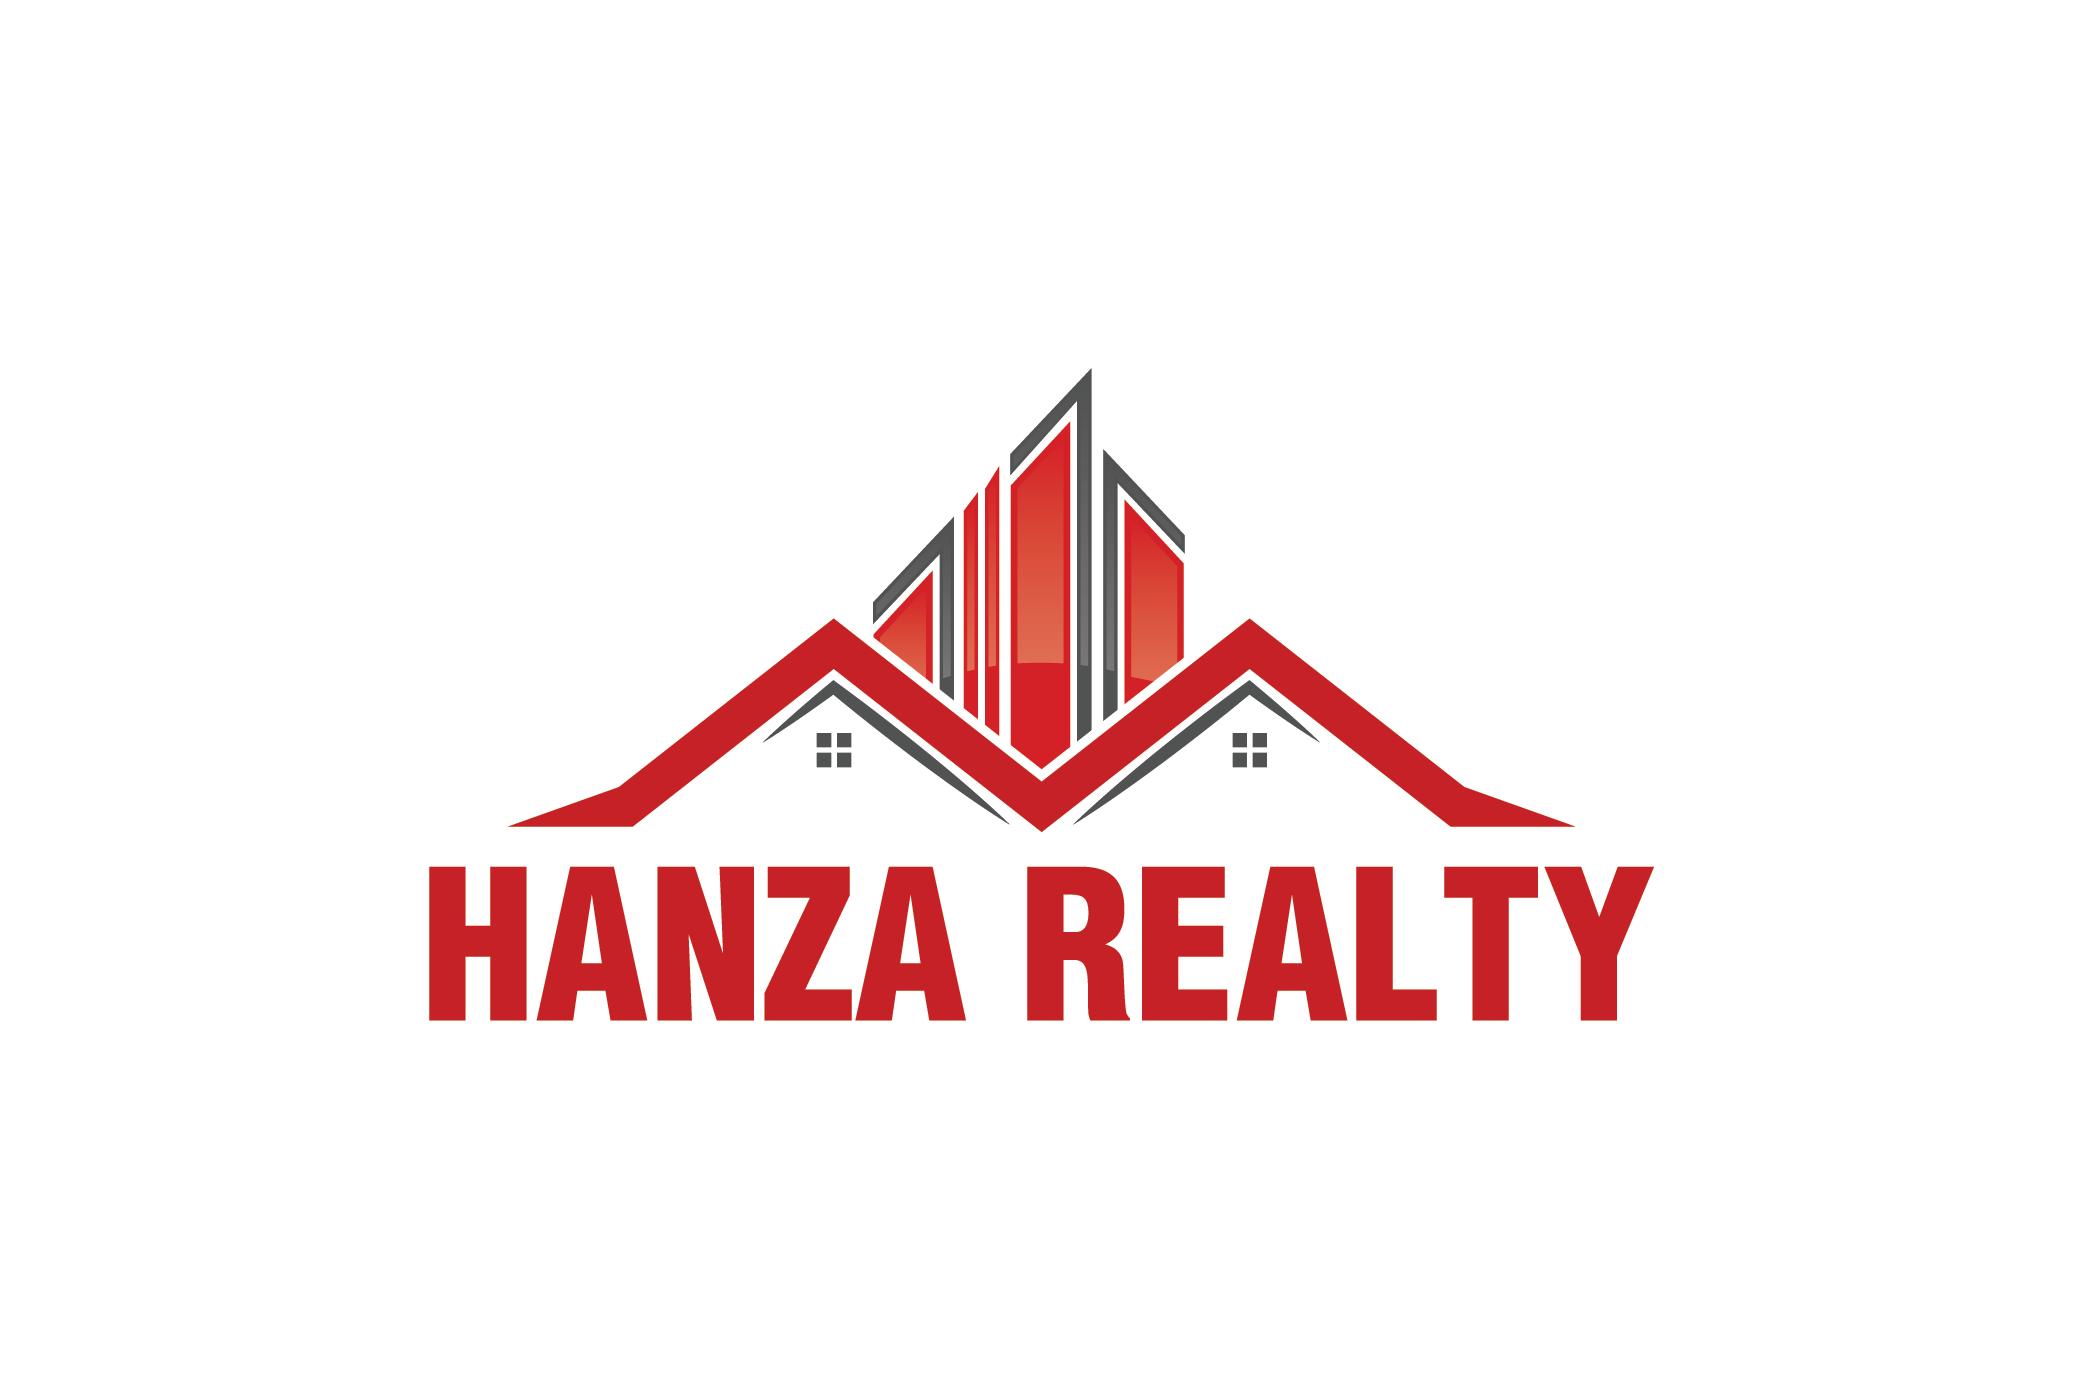 Logo Design by Raheel Baloch - Entry No. 111 in the Logo Design Contest Logo Design for Hanza Realty.